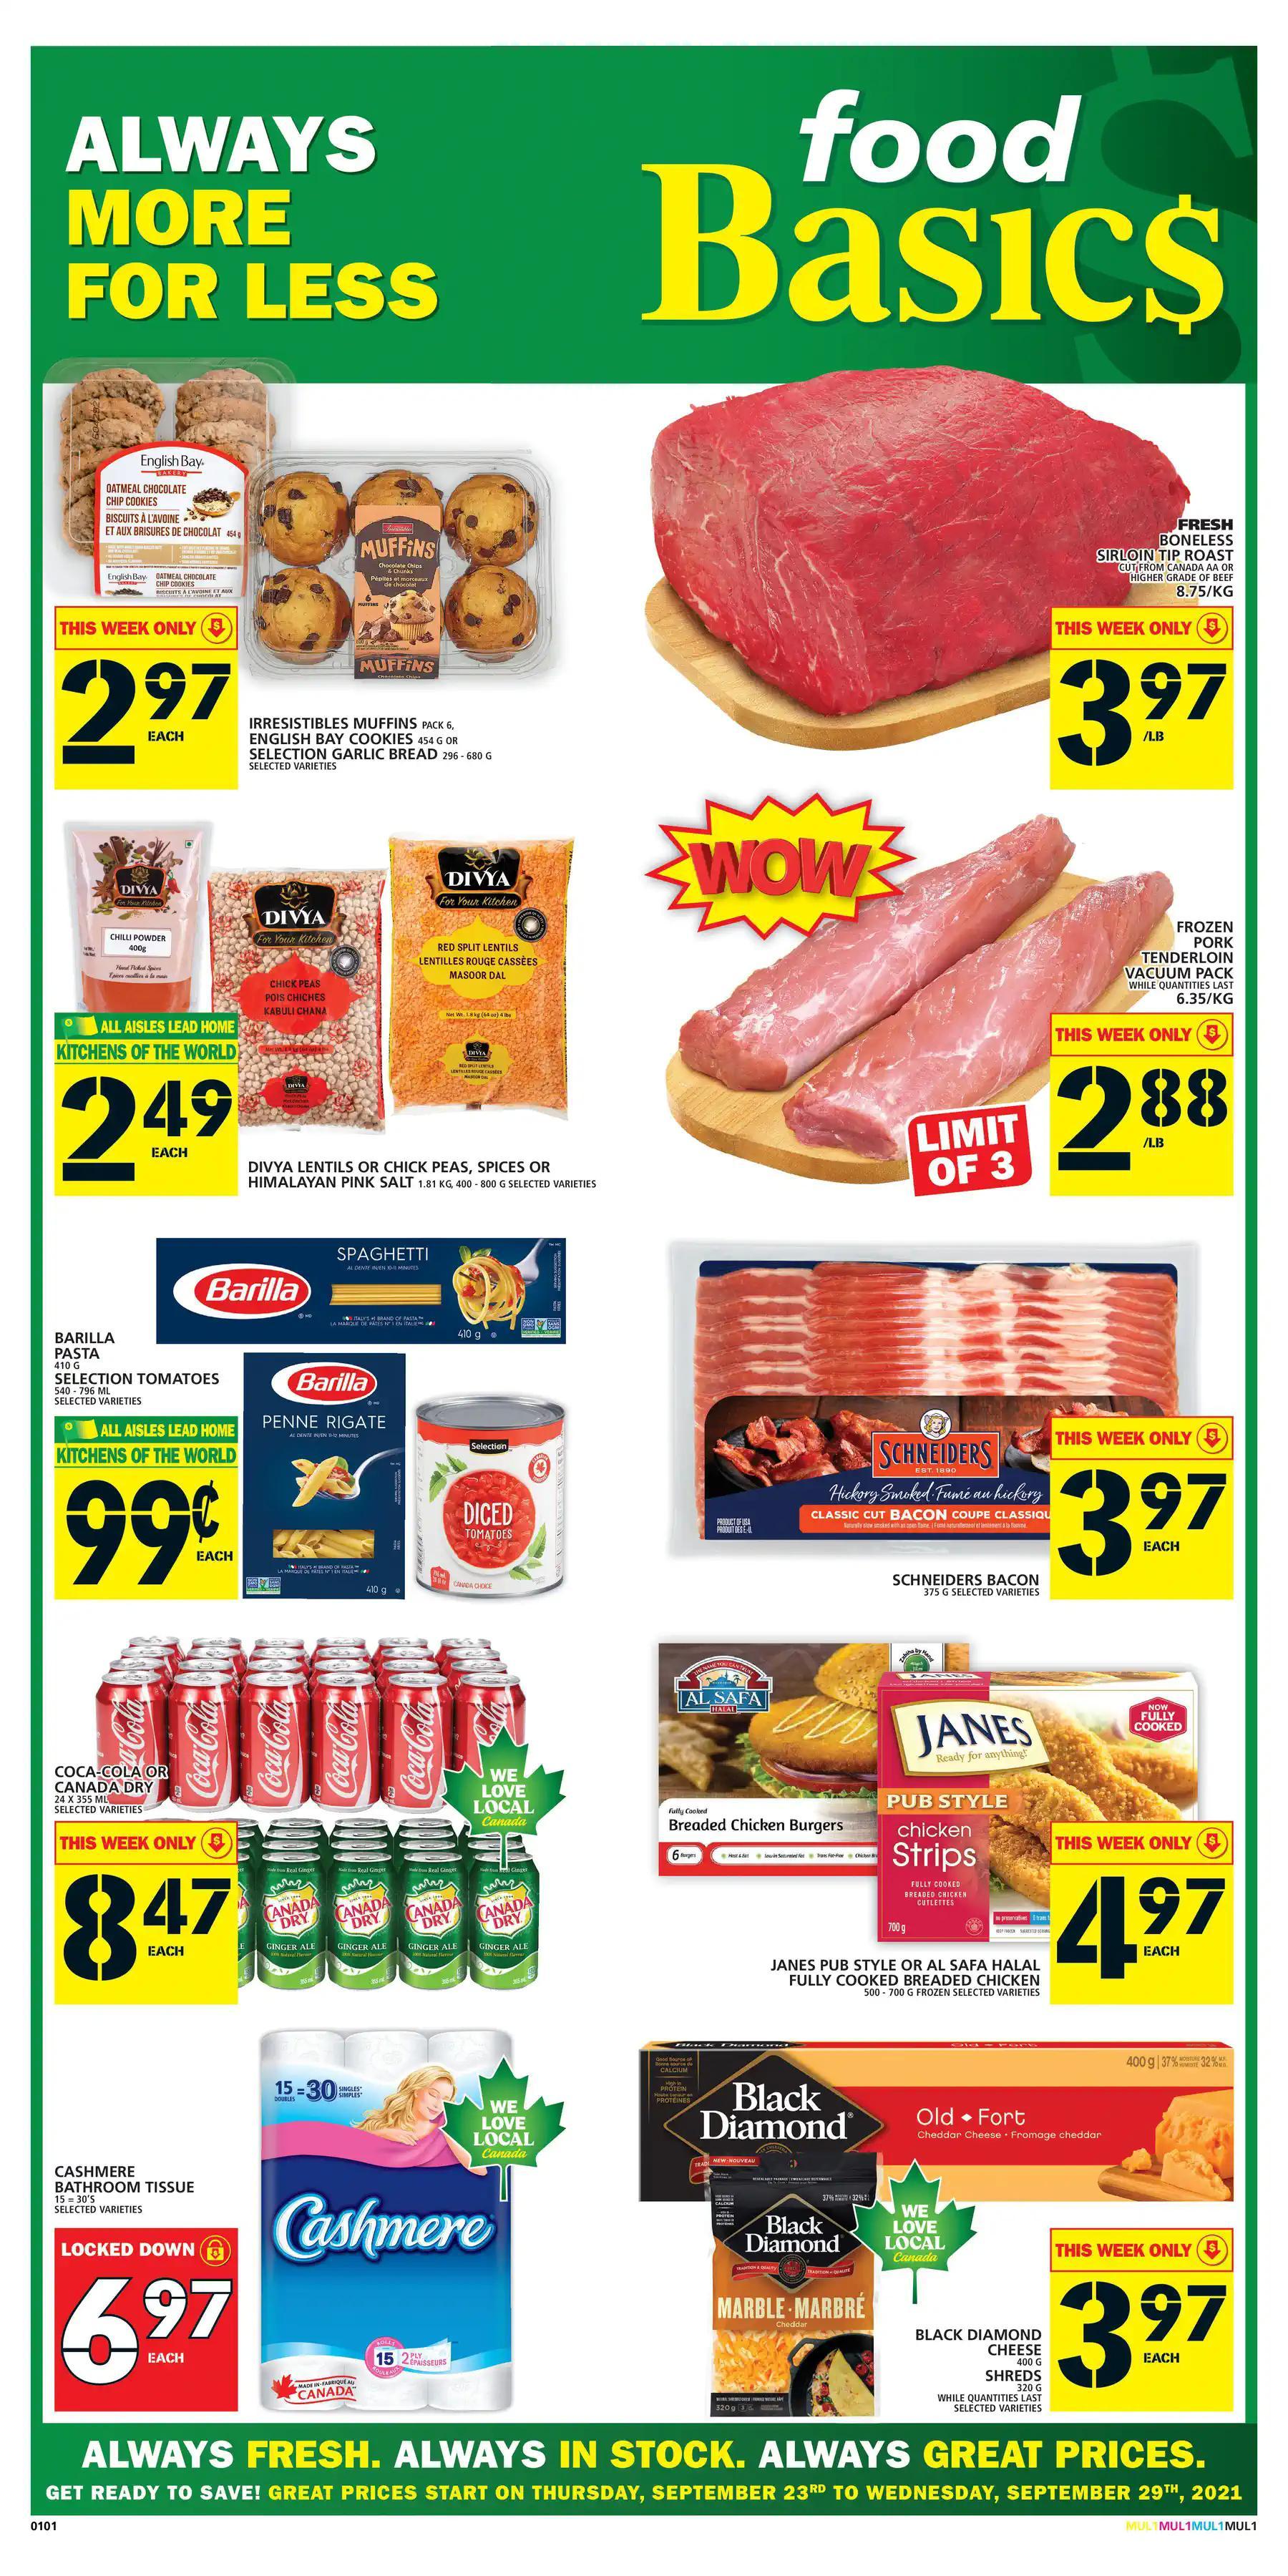 Food Basics - Weekly Flyer Specials